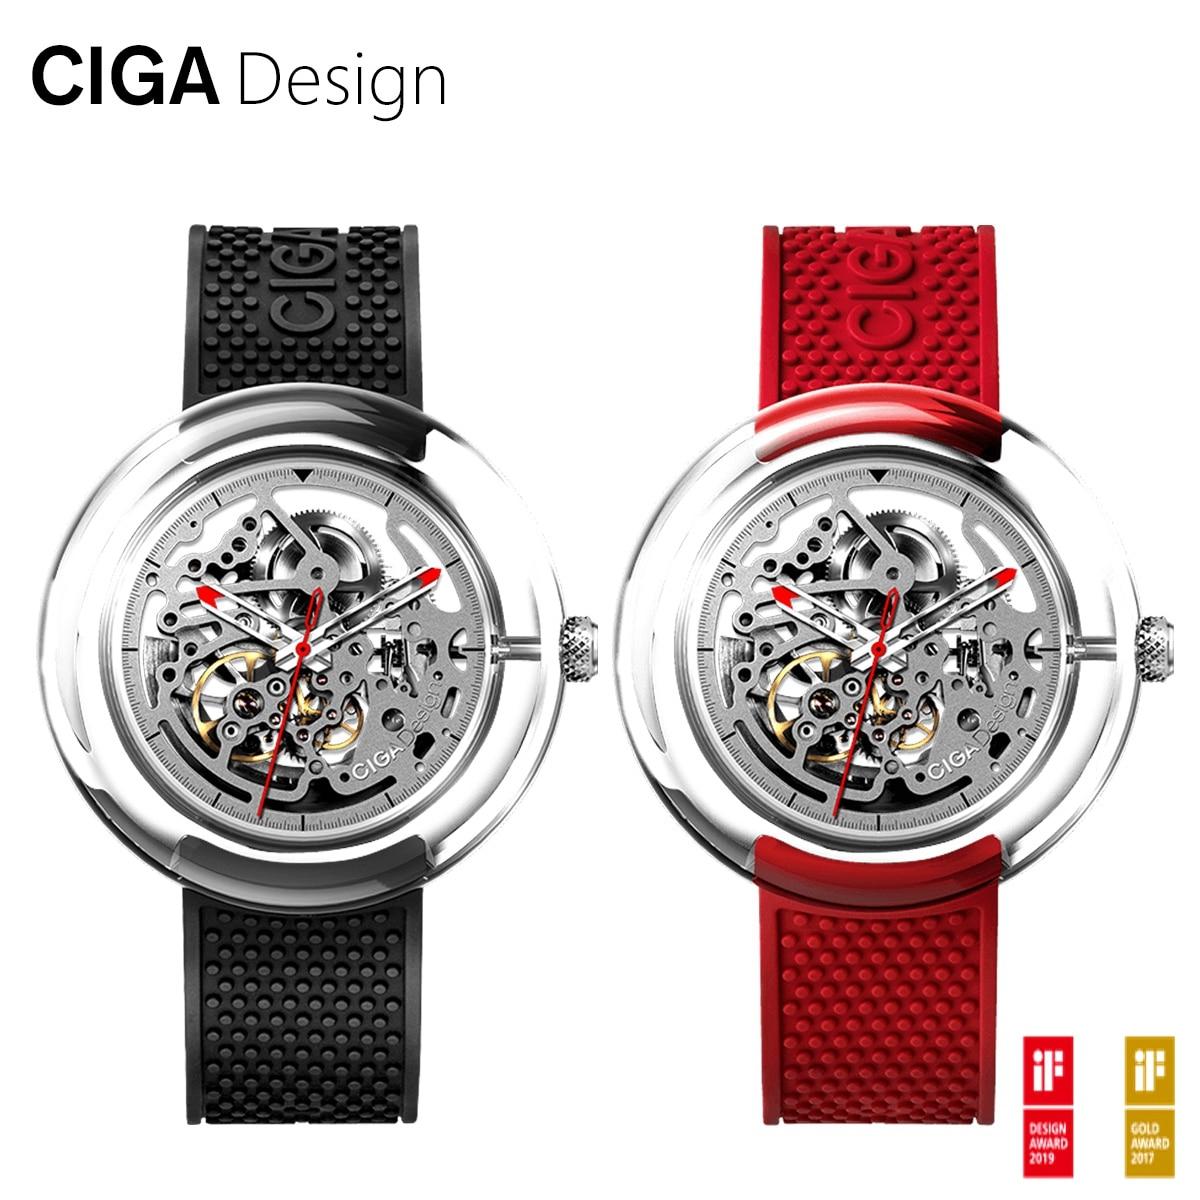 CIGA Design CIGA Watch T Series Mechanical Watch Transparent Hollow Watch Female Mechanical Watch Female Watch